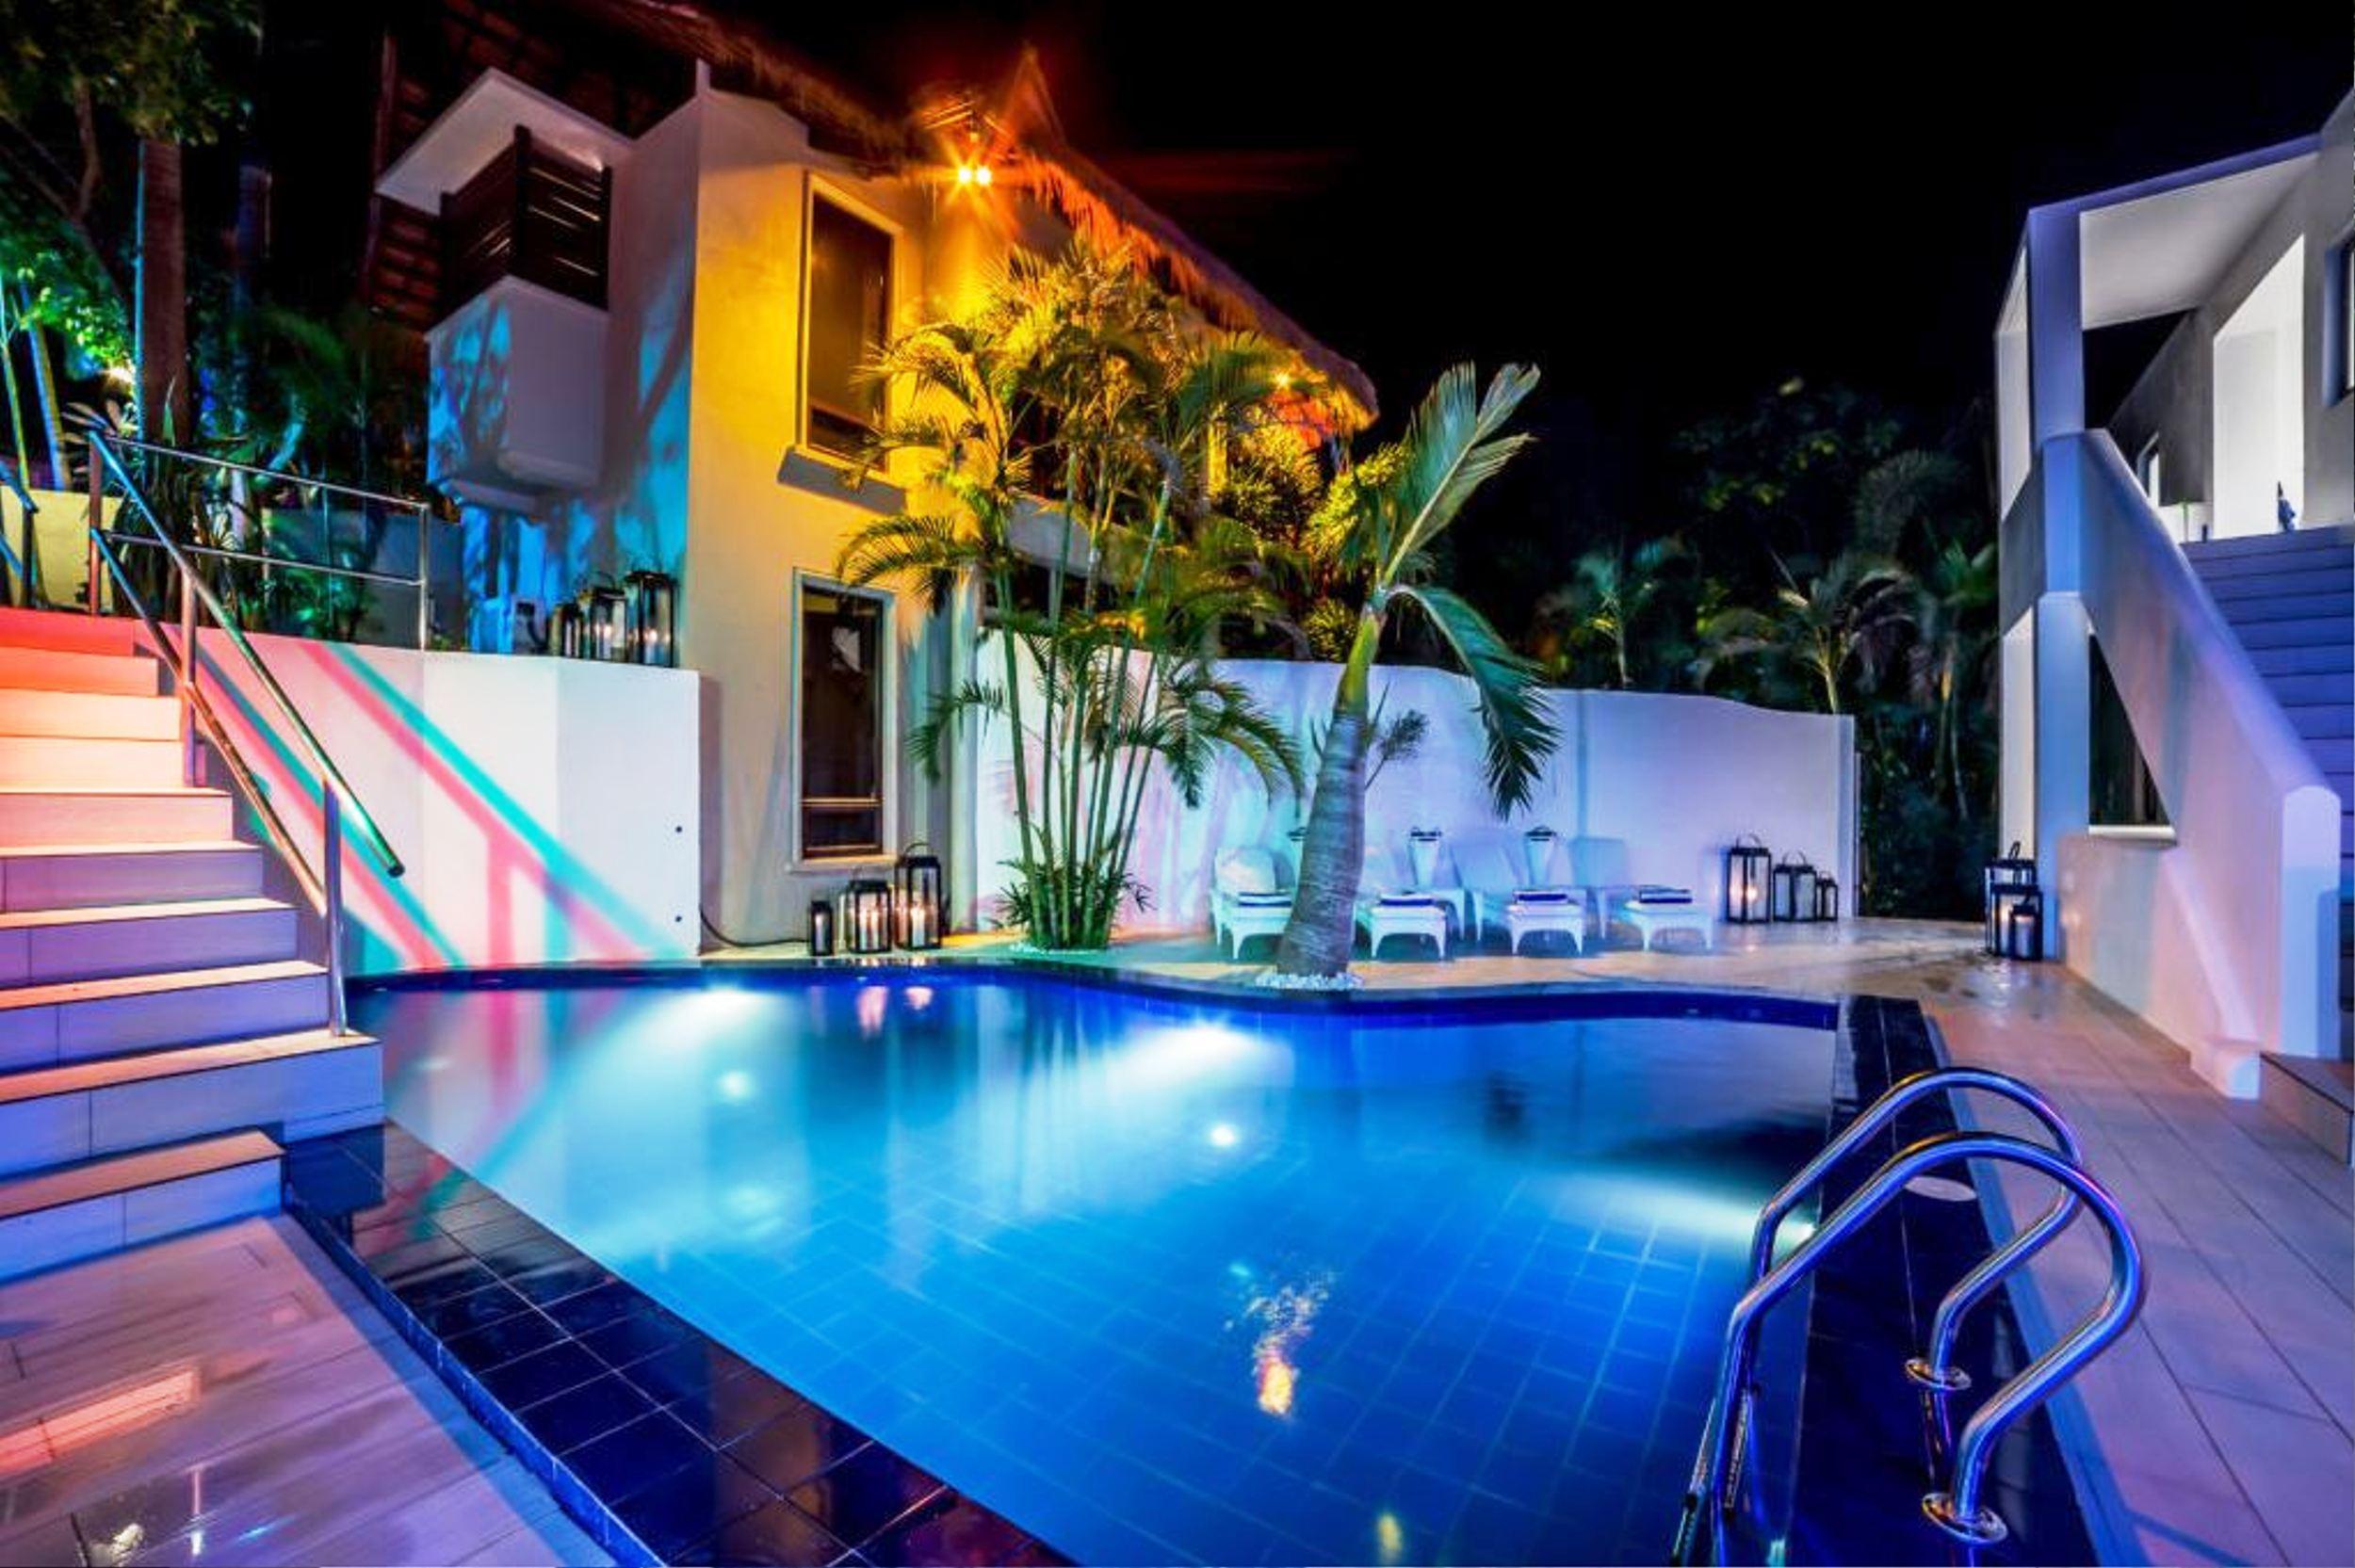 Den Pasar Boracay Luxury Apartments, Malay